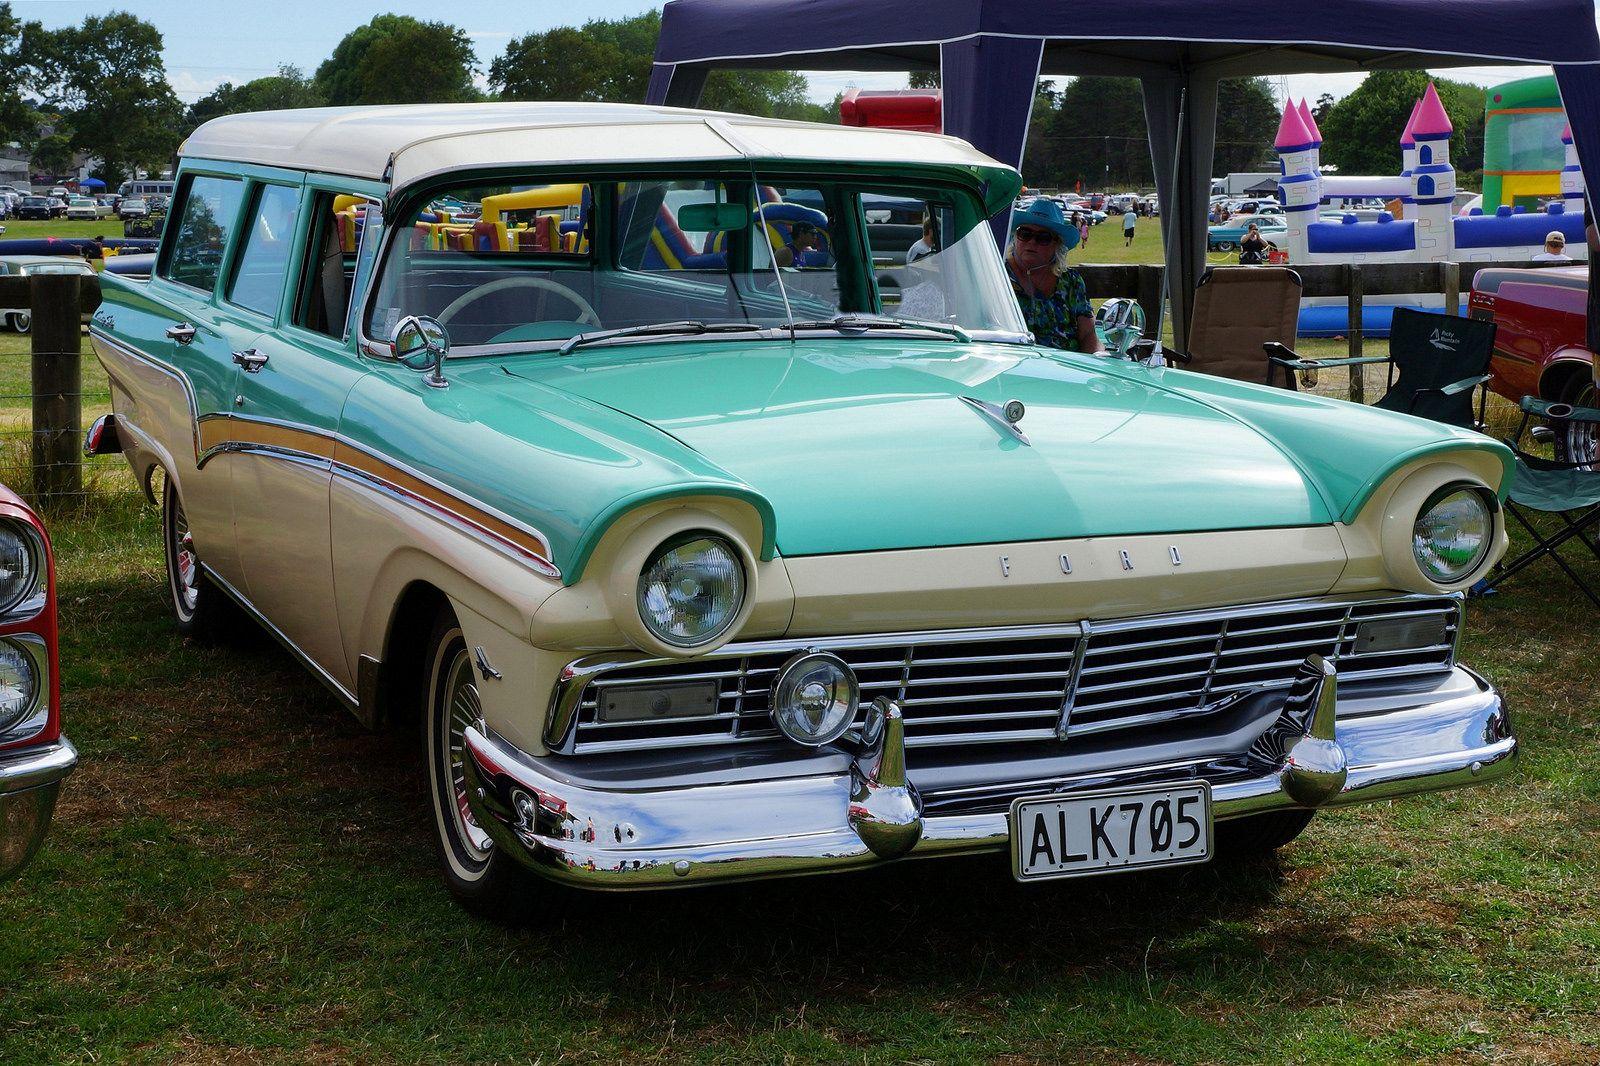 1957 Ford Country Wagon 60s Pinterest Cars And Vehicles 1953 Plymouth Savoy At Kumeu Nz Car Station